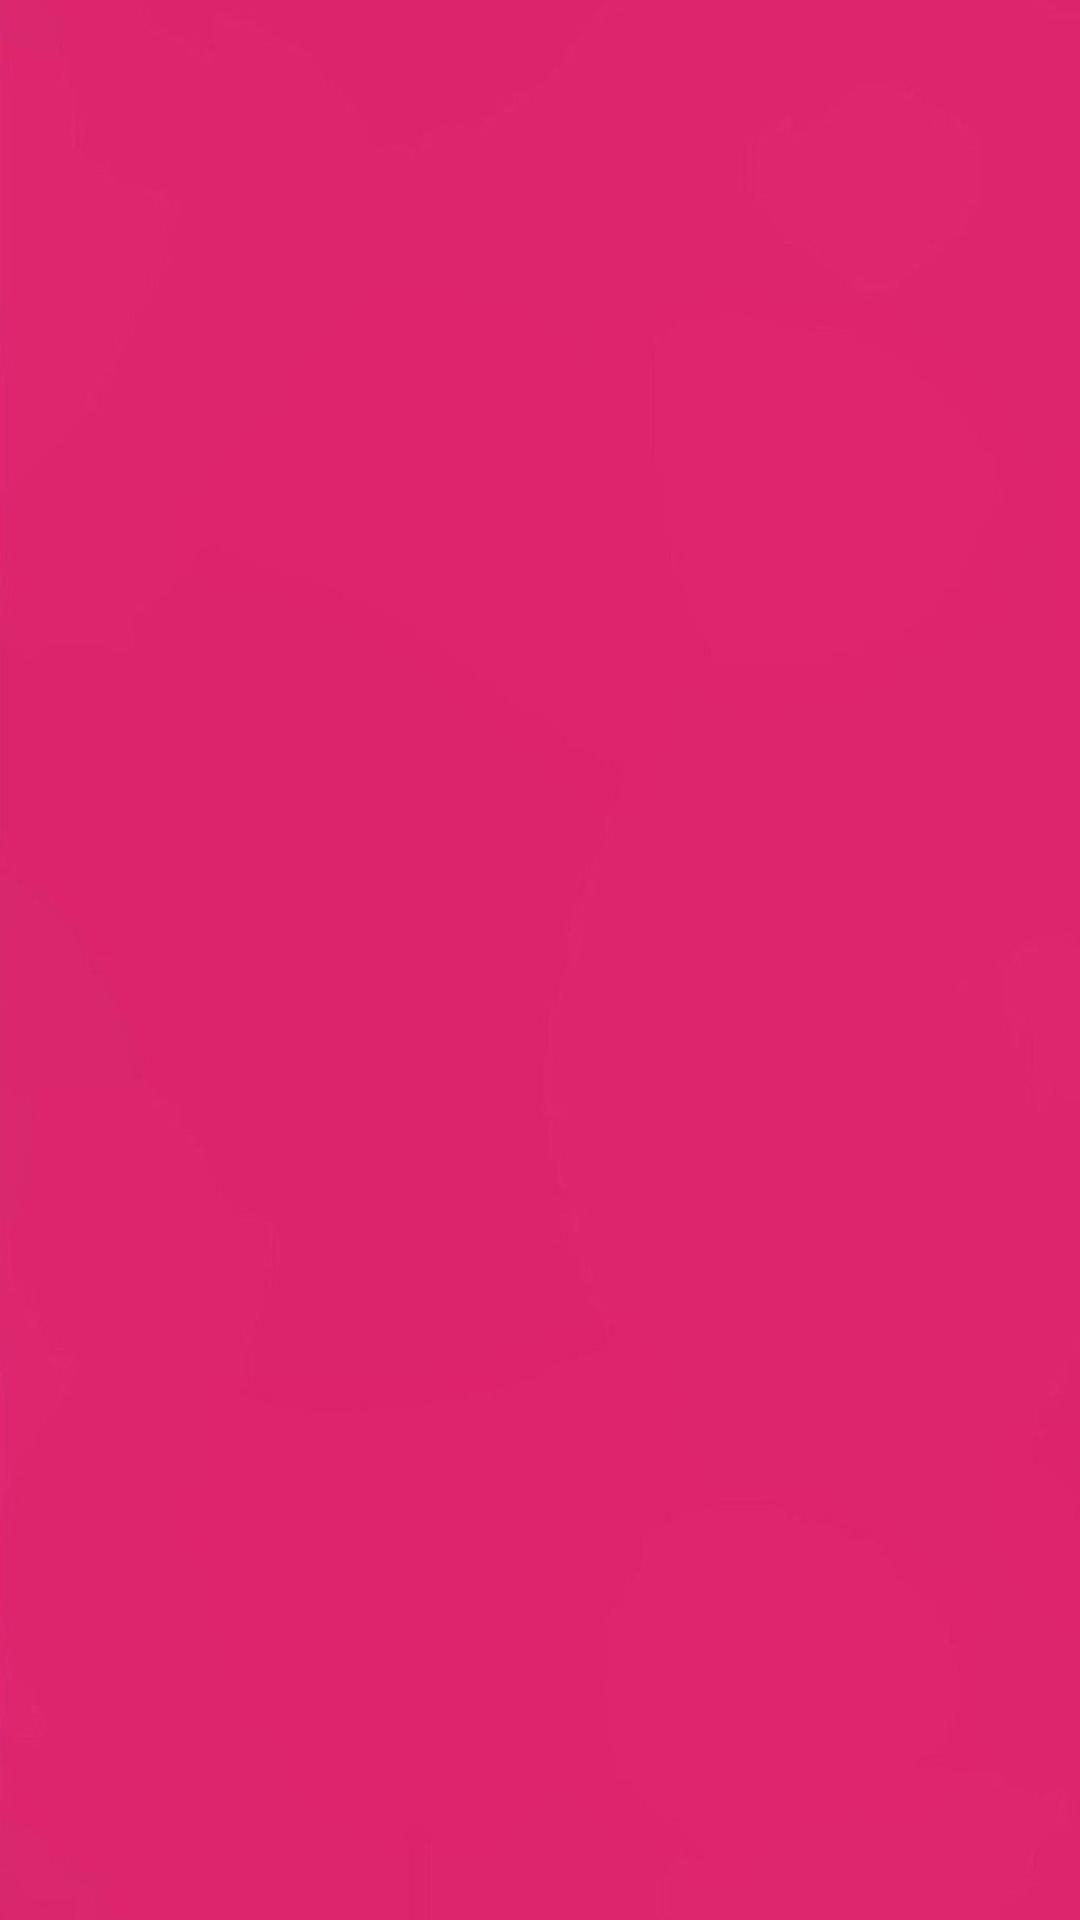 Iphone 5 Wallpaper Pink Pink Solid Iphone Wallpaper